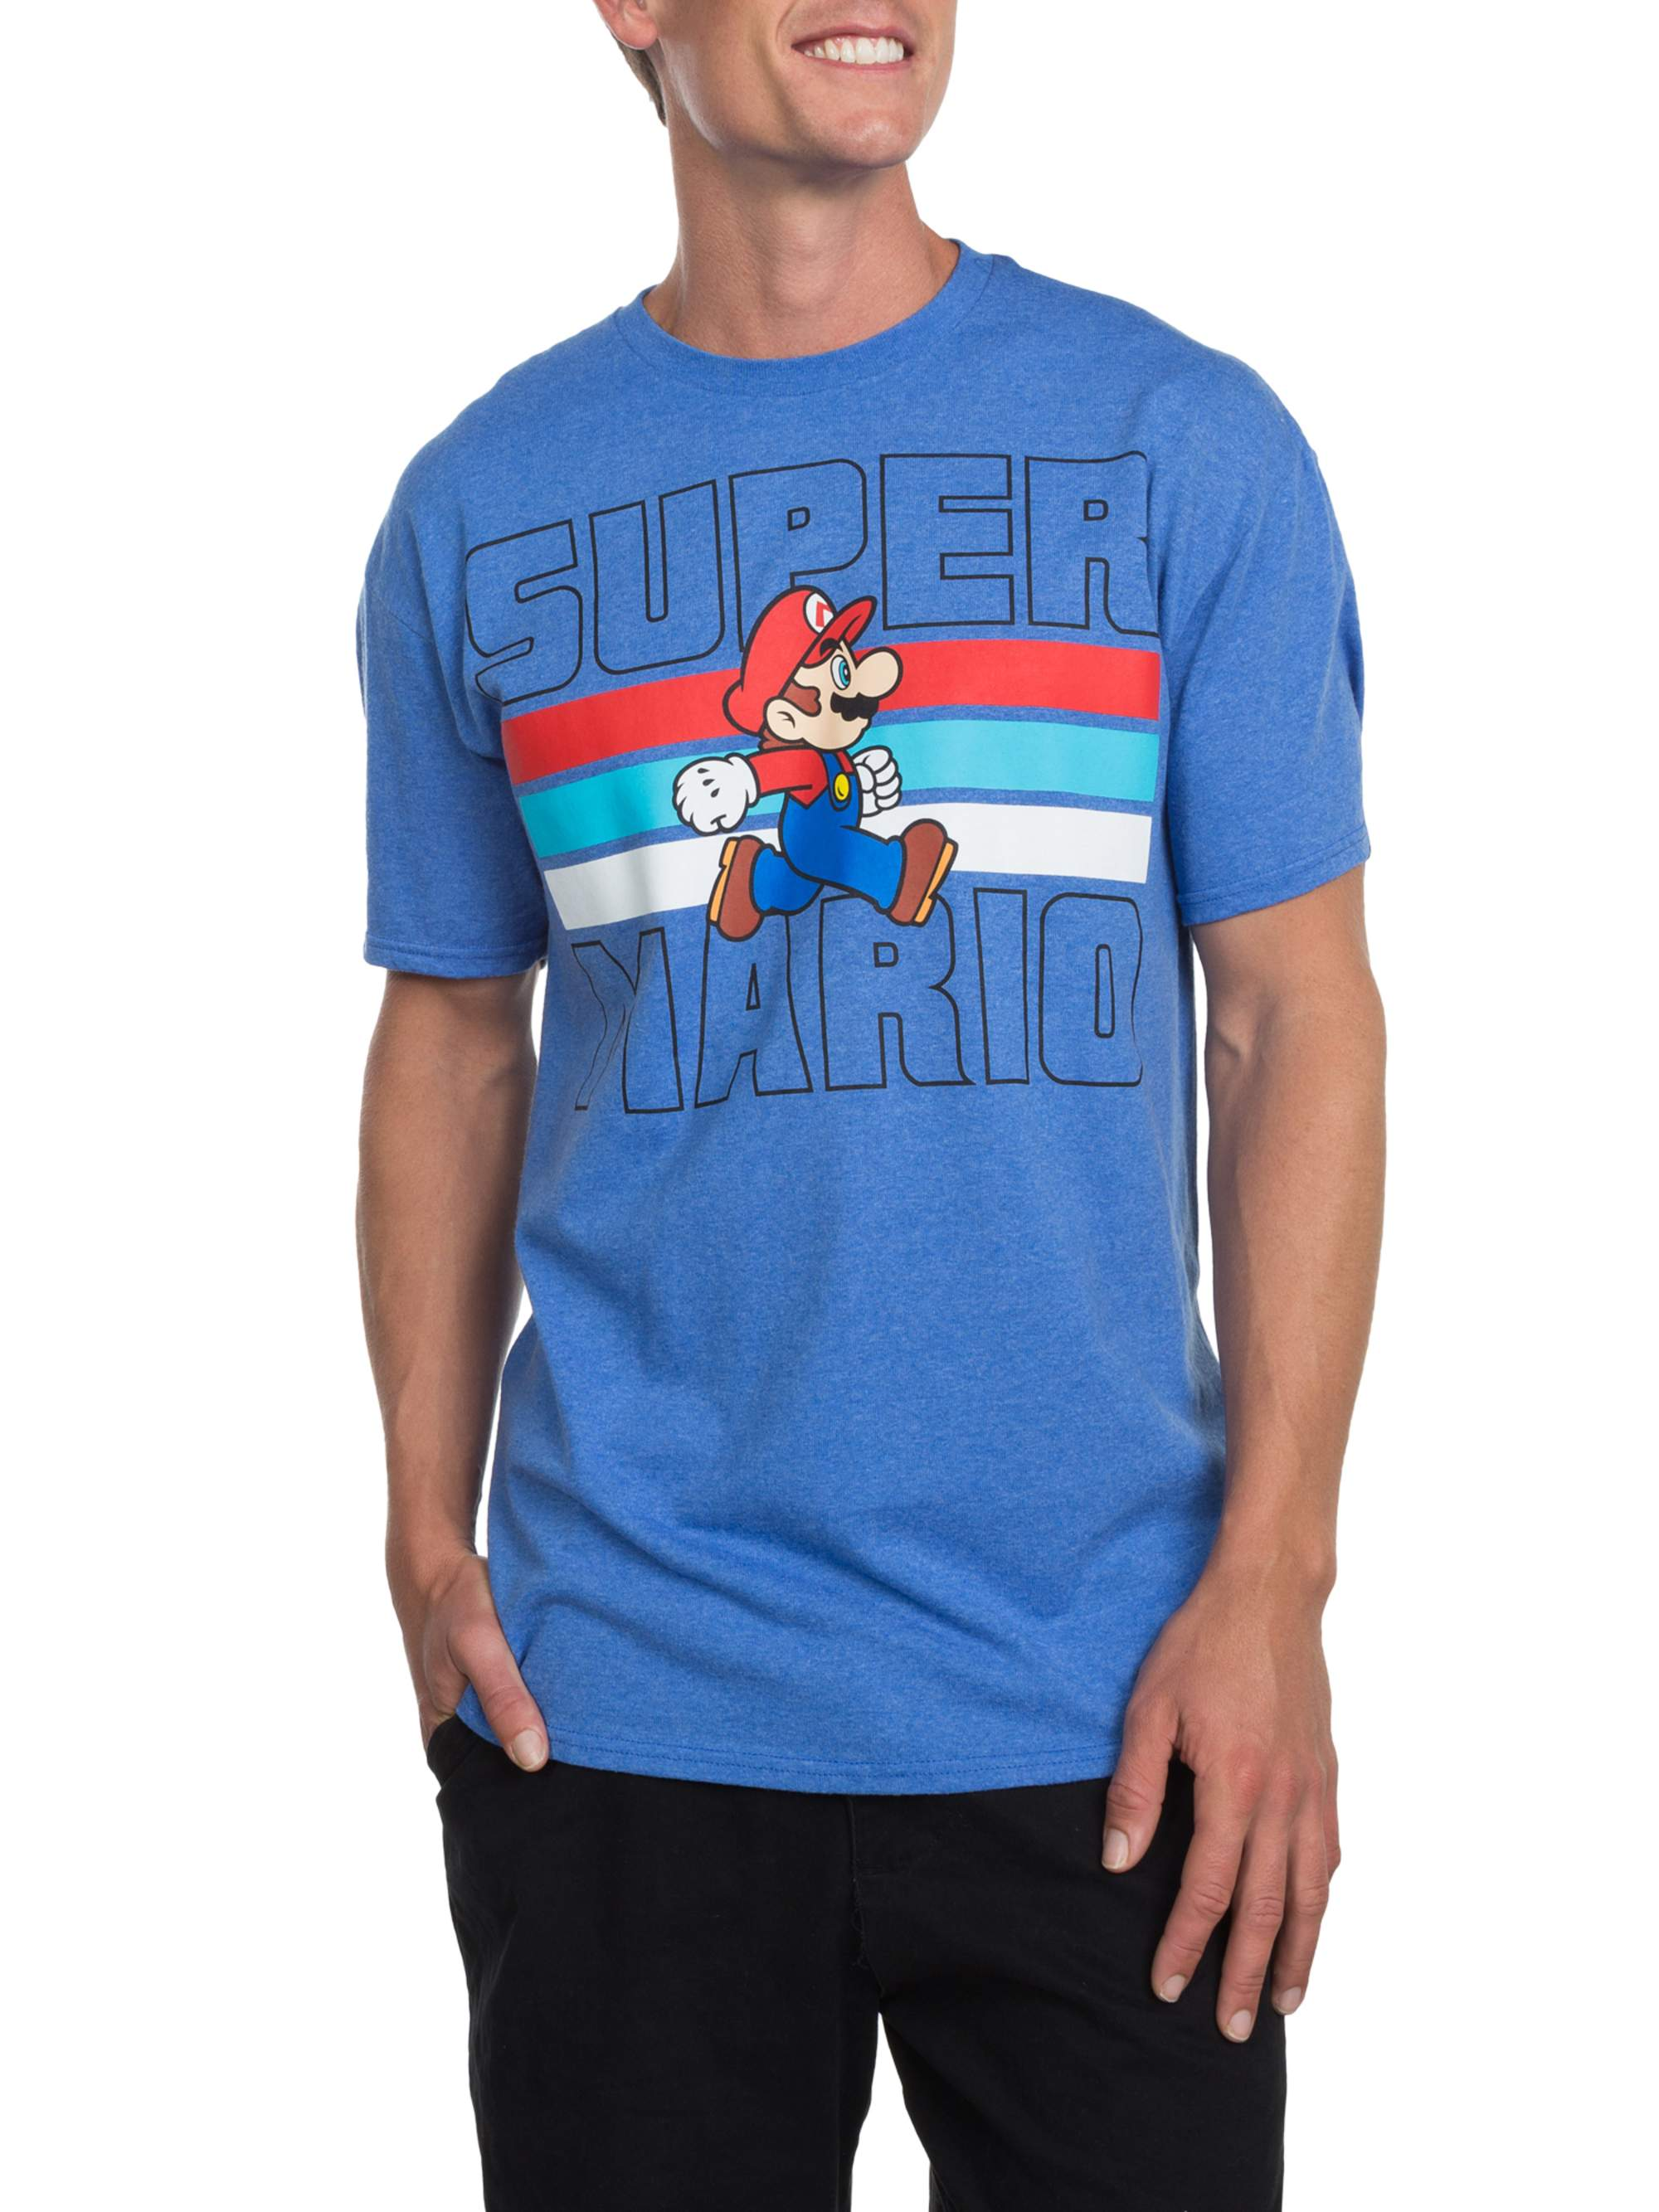 Super Mario Americana Men's Short Sleeve T-shirt, up to Size 3XL